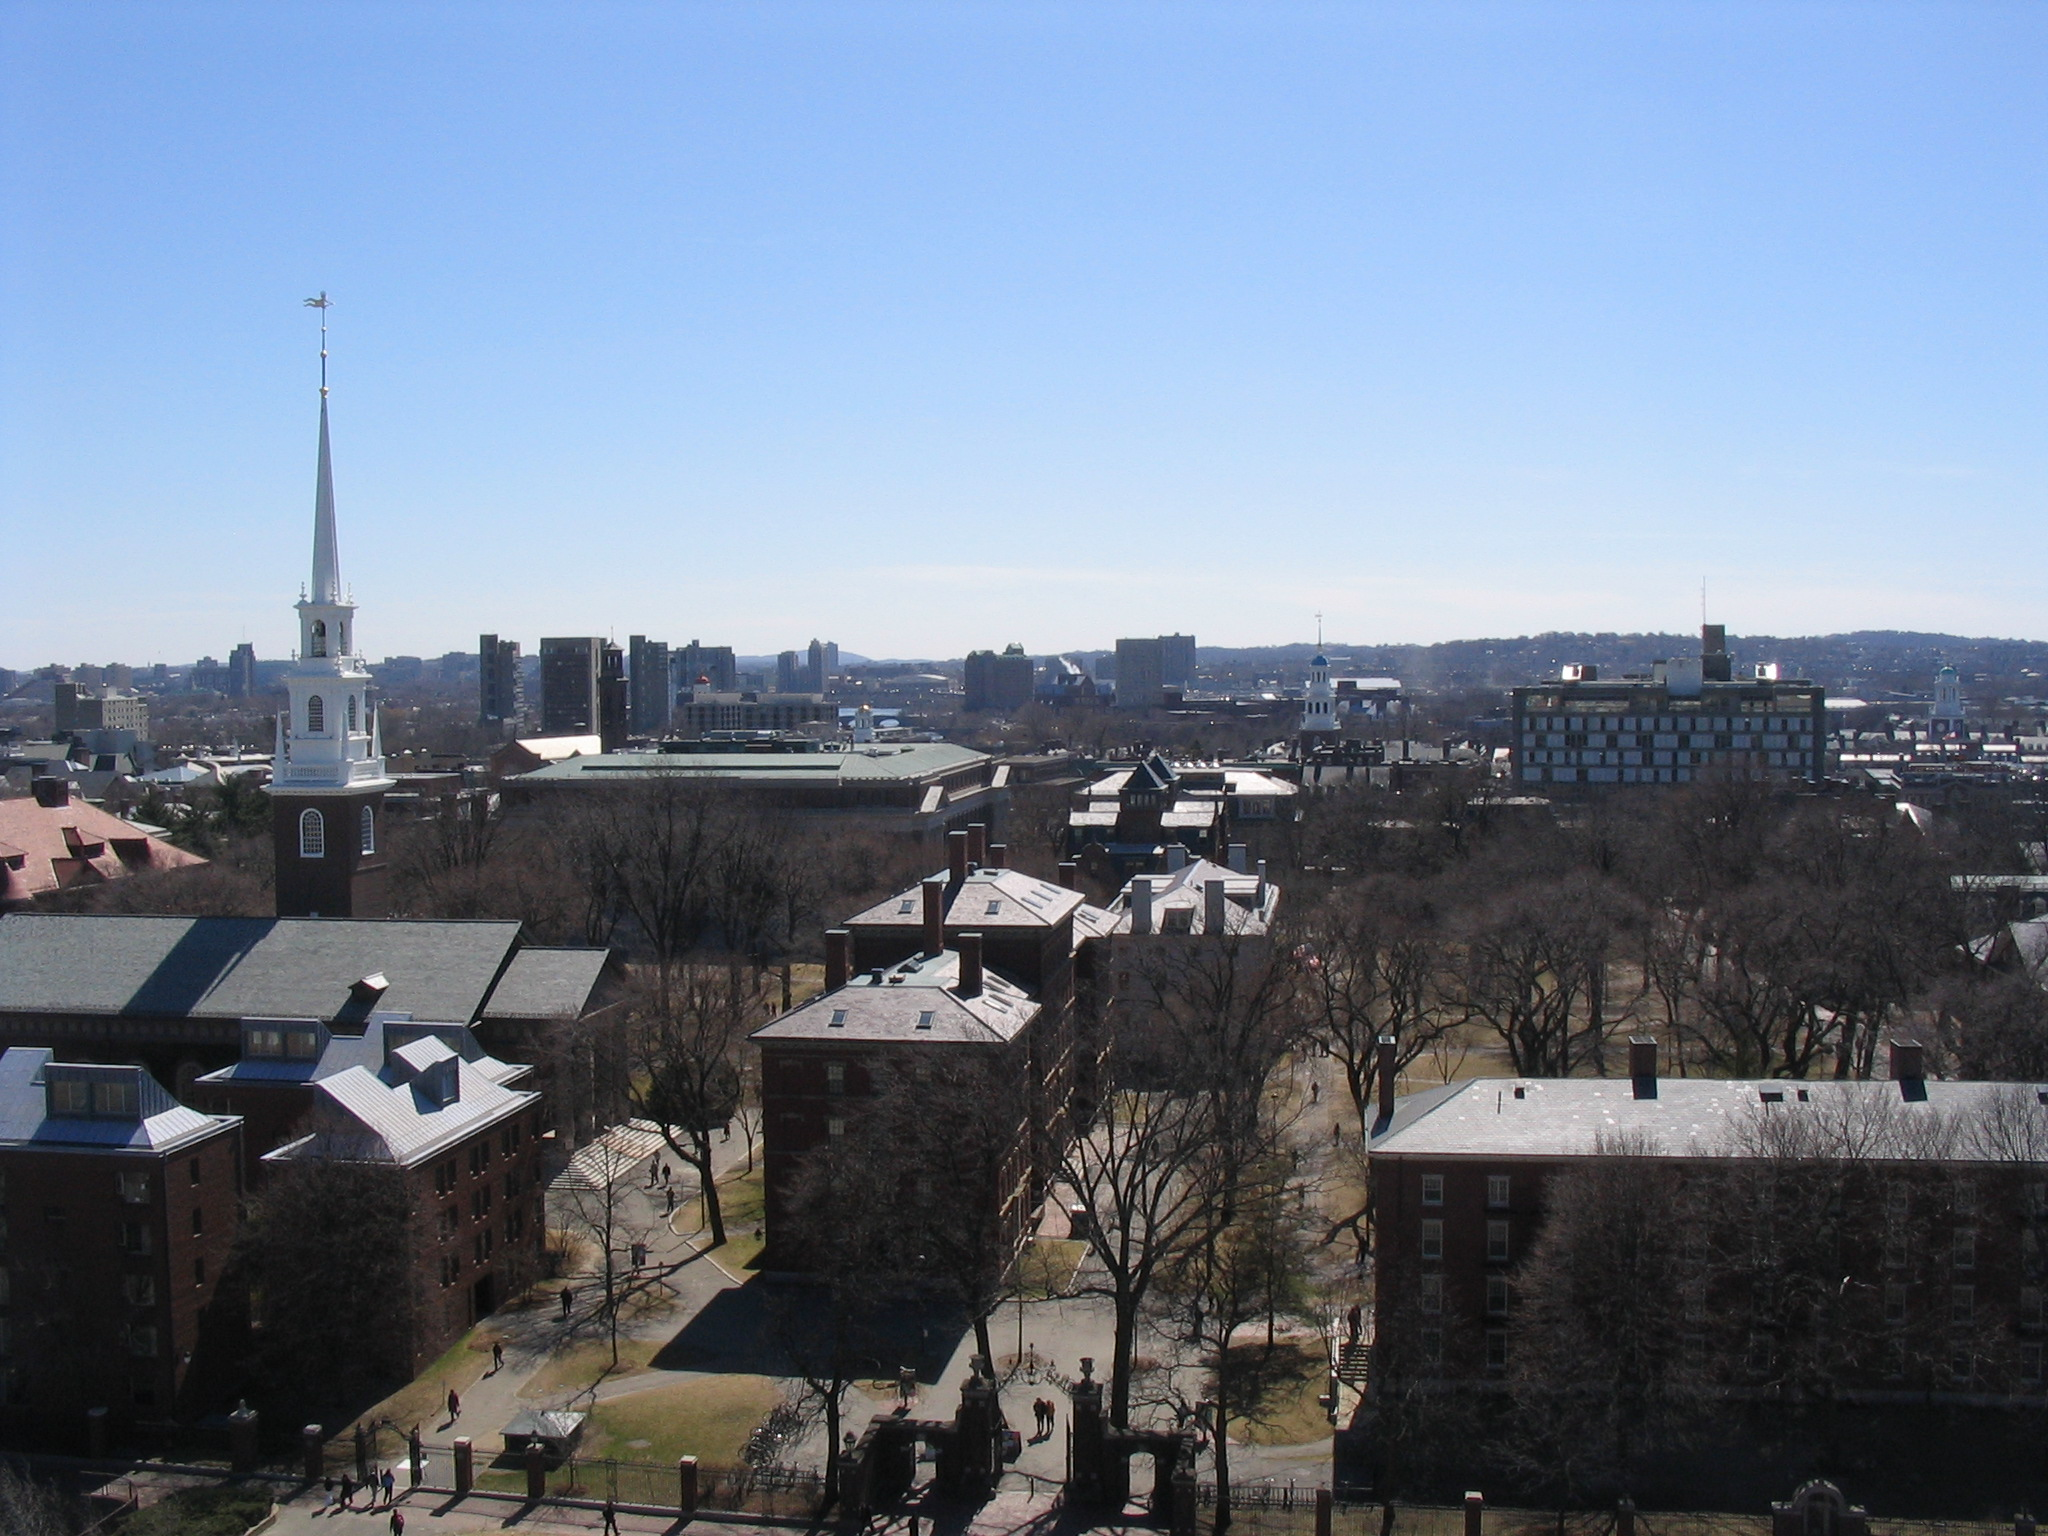 Boston, terrorism, and racial profiling of motive